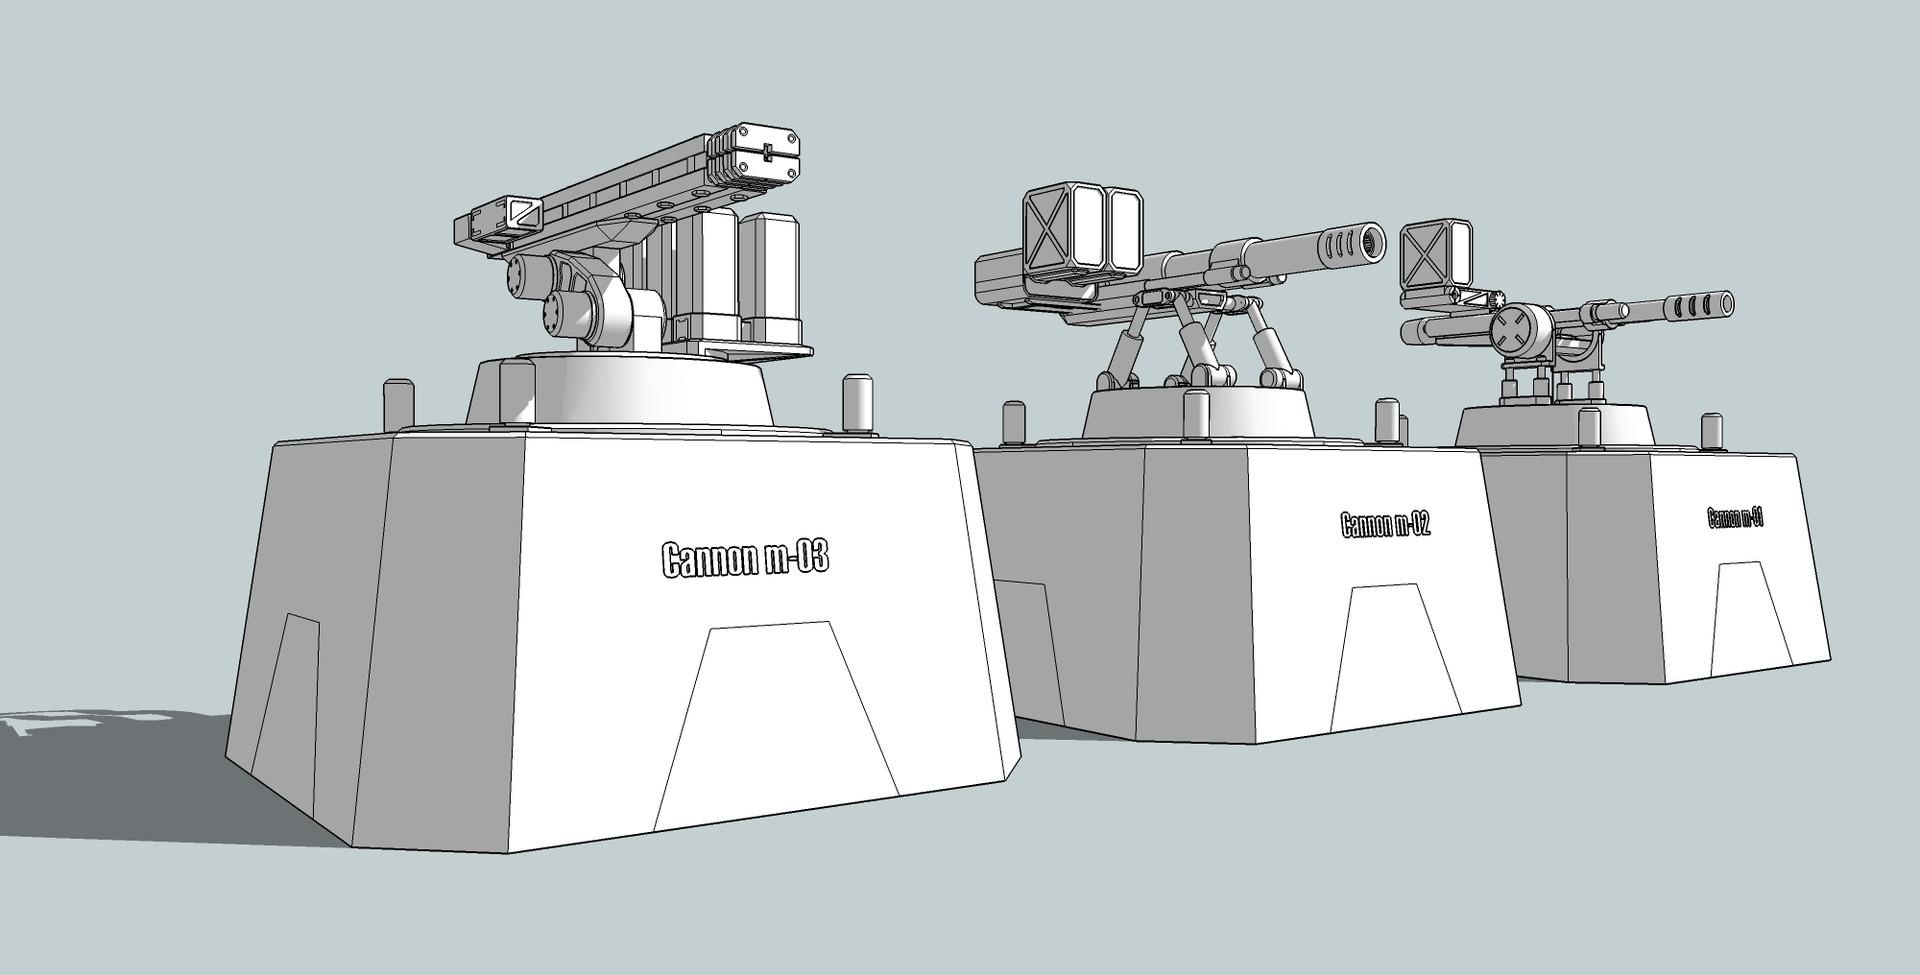 Ragnar plinkner 2012 08 01 cannon 01 02 03 01